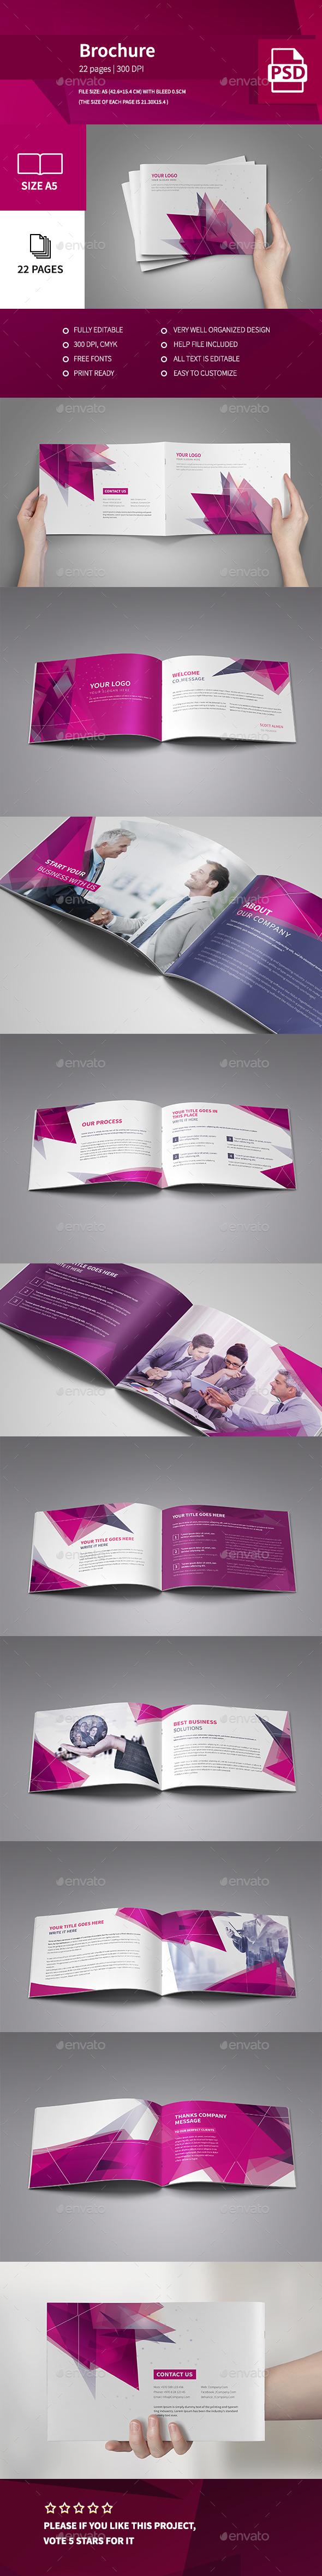 Corporate Colorful Modern Brochure 2016 - Corporate Brochures